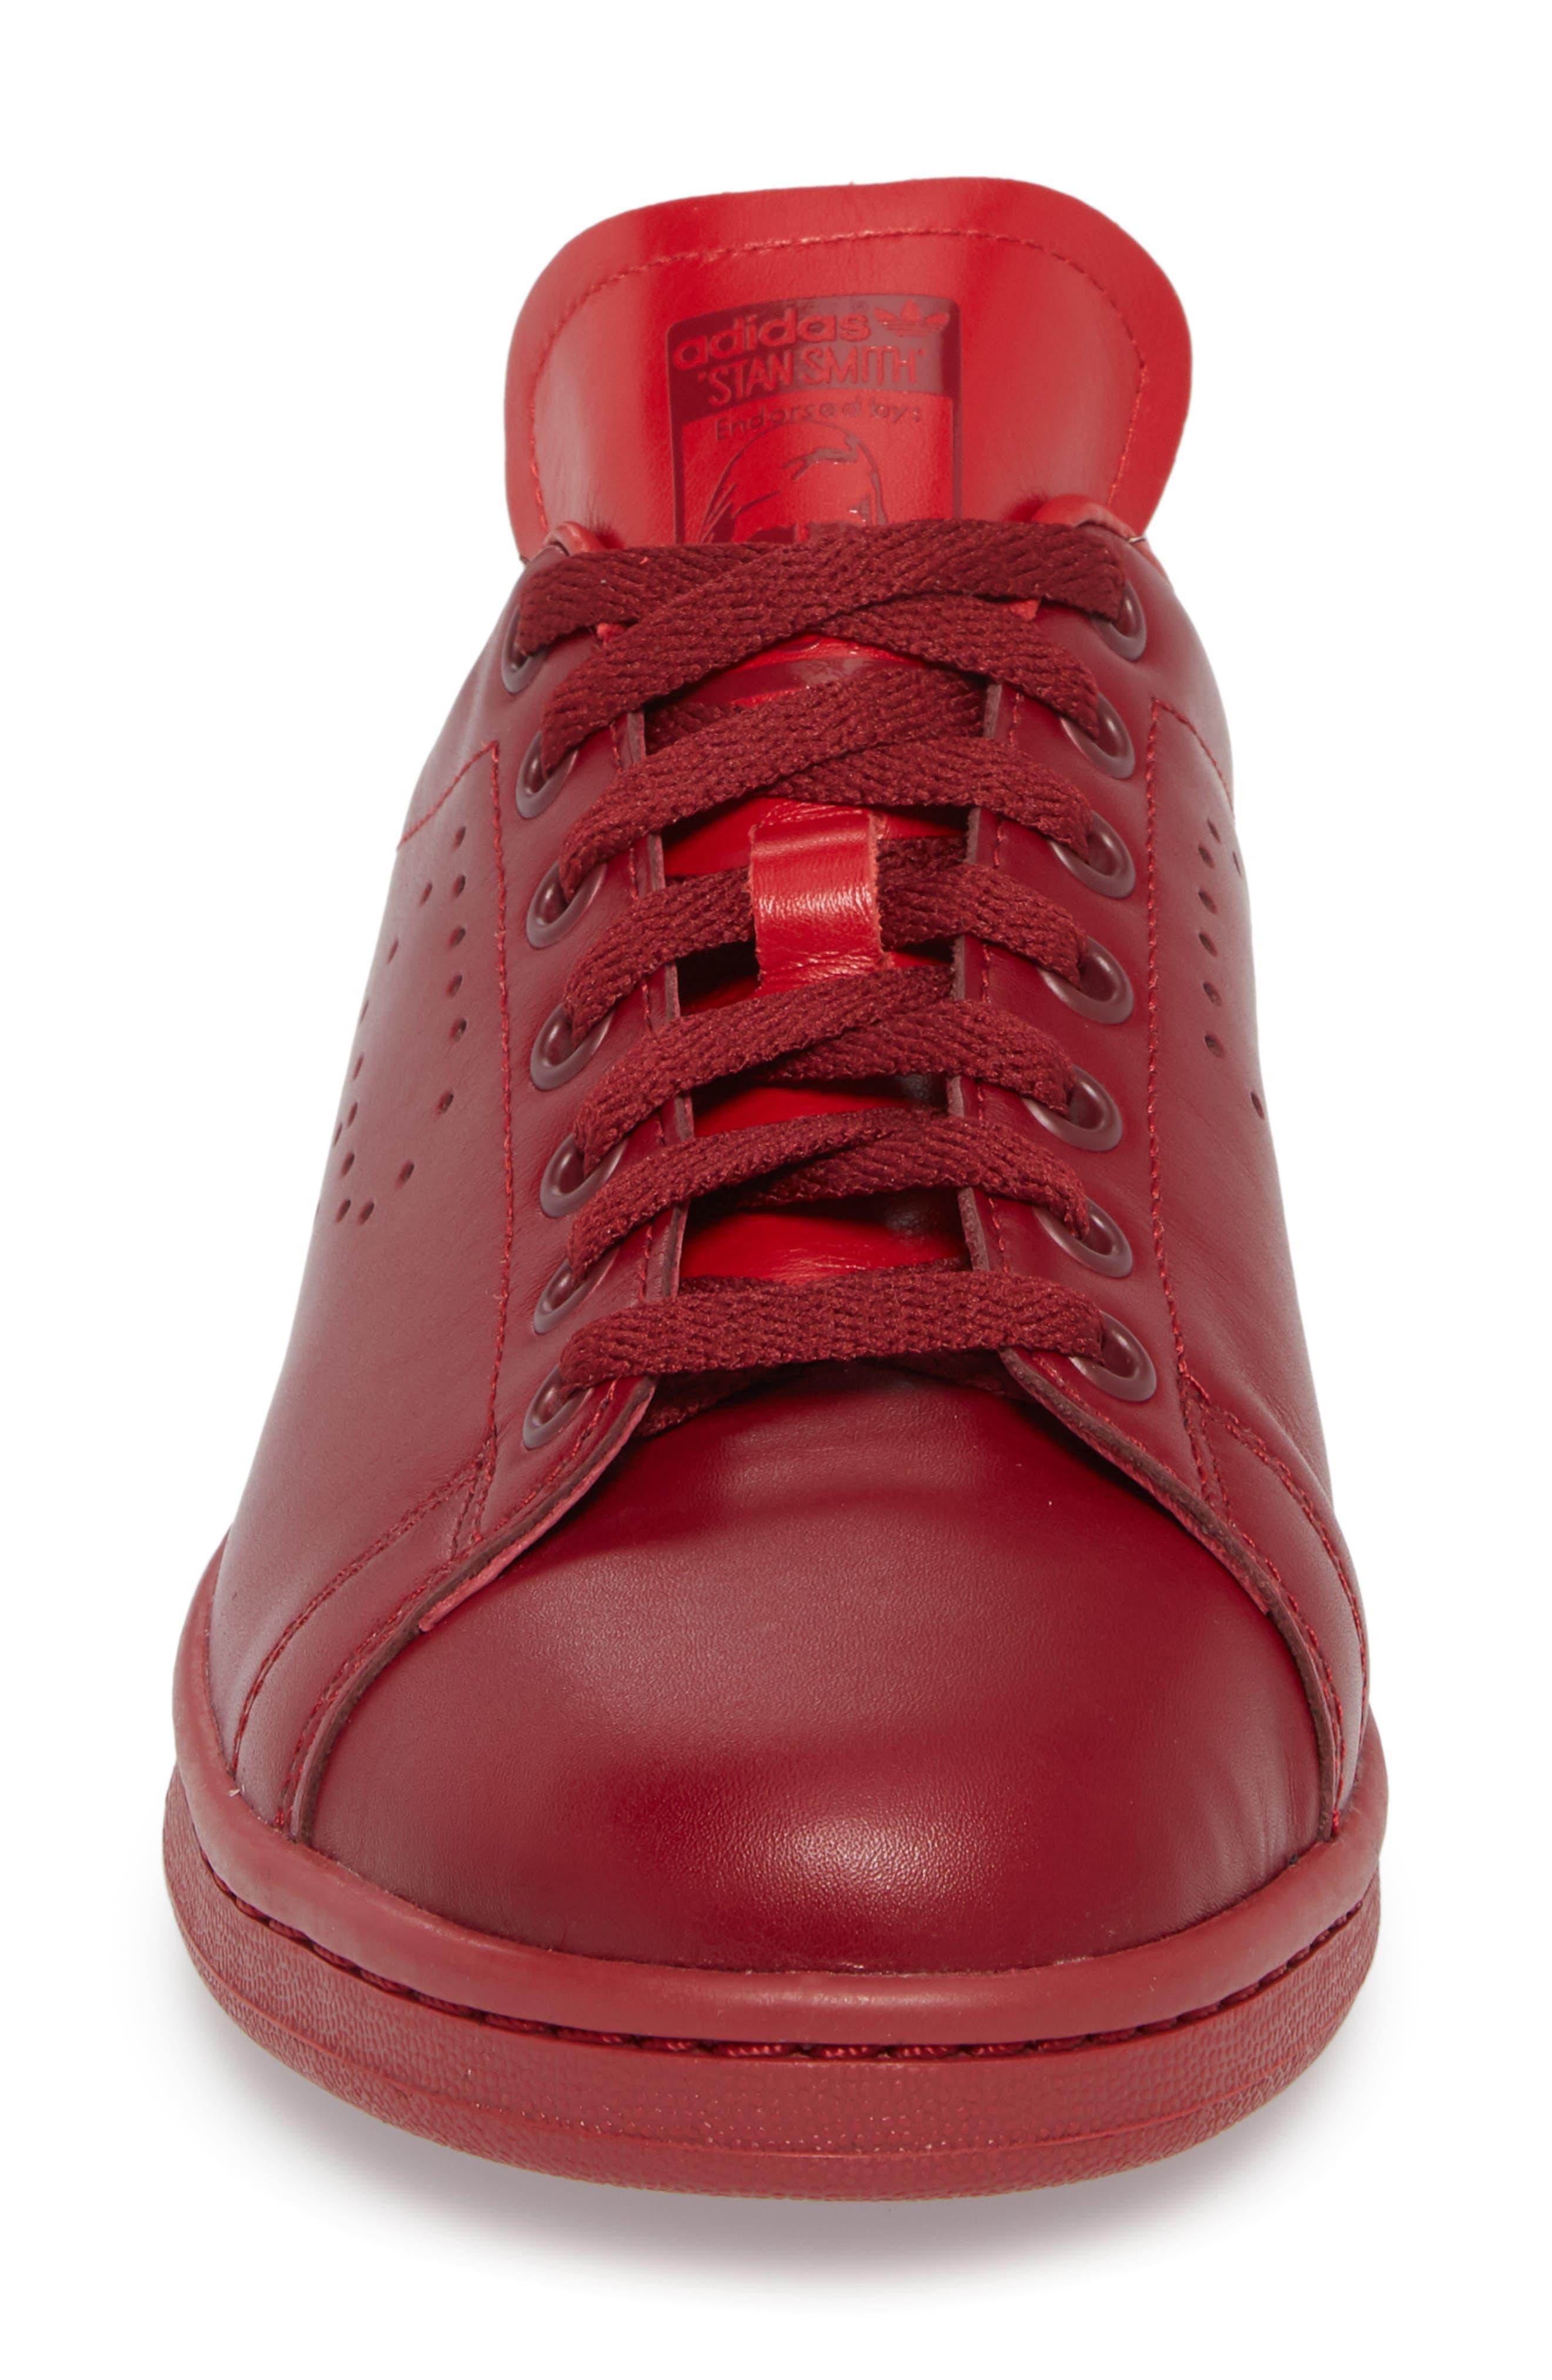 Stan Smith Sneaker,                             Alternate thumbnail 4, color,                             Burgundy/ Power Red/ Burgundy